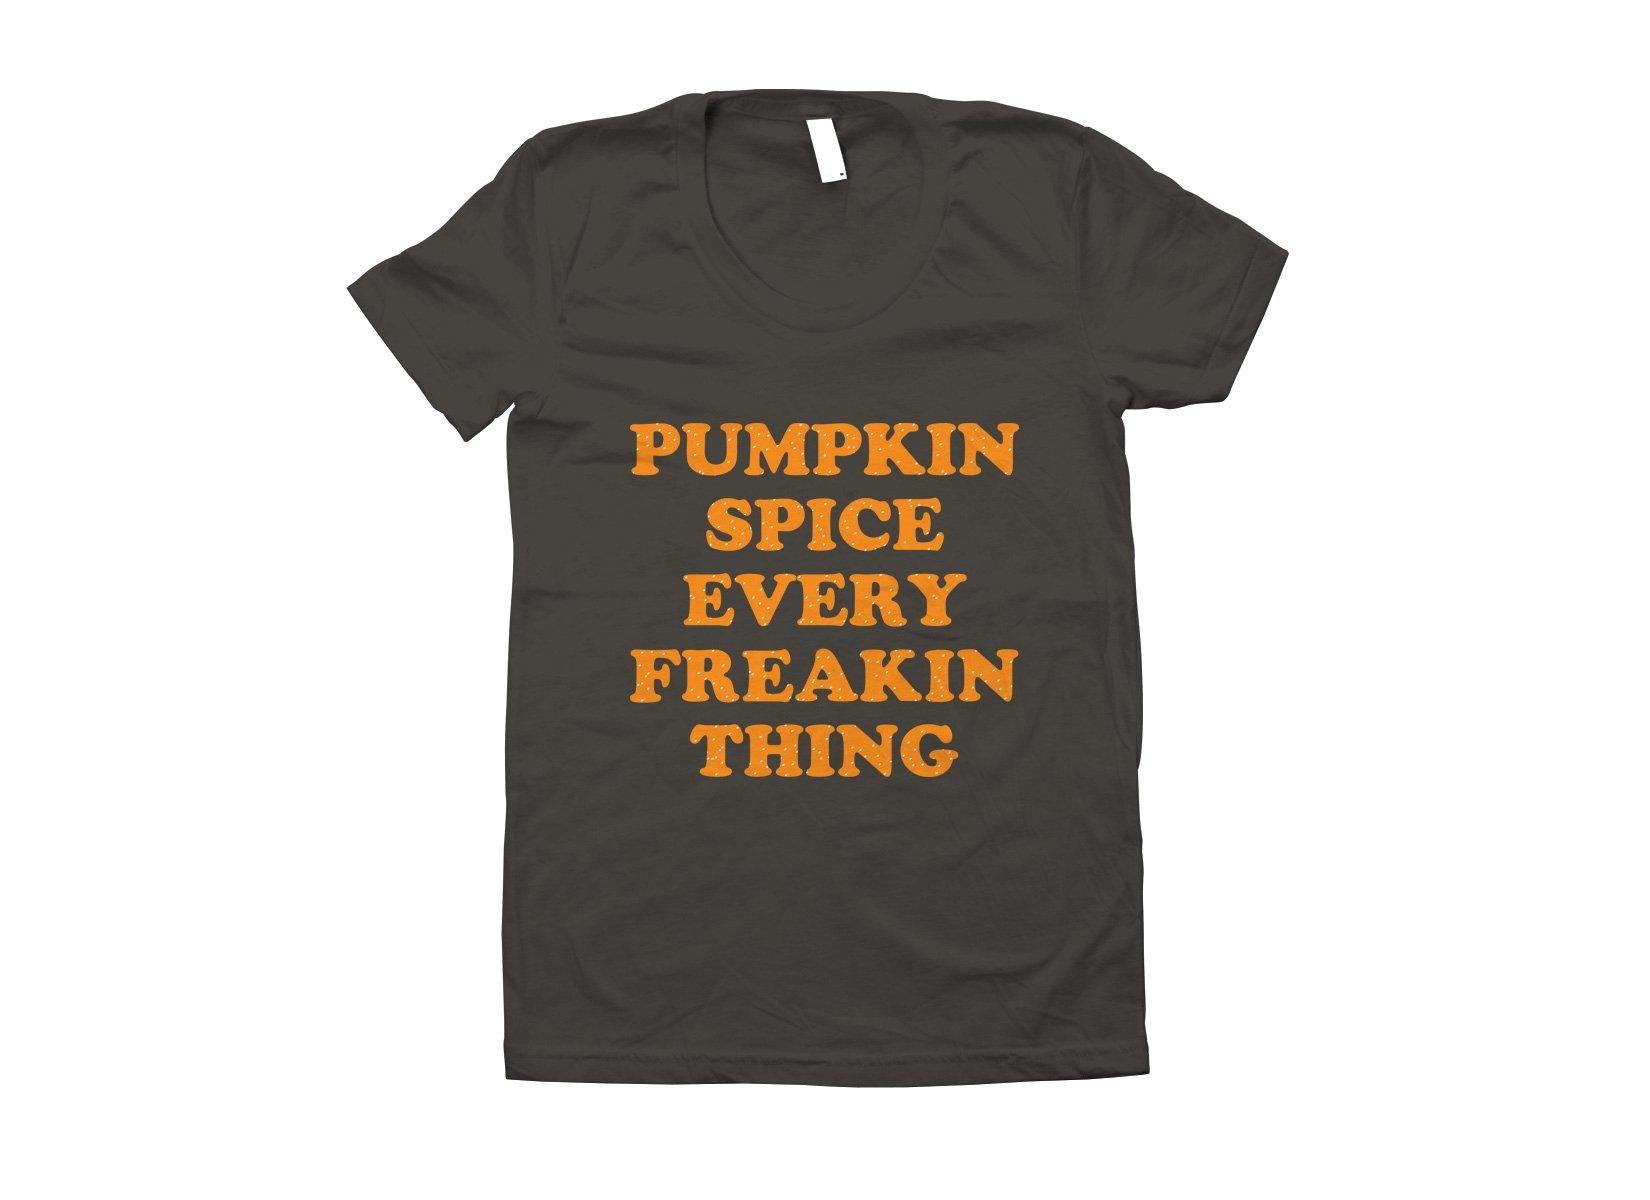 Pumpkin Spice Every Freakin Thing on Juniors T-Shirt